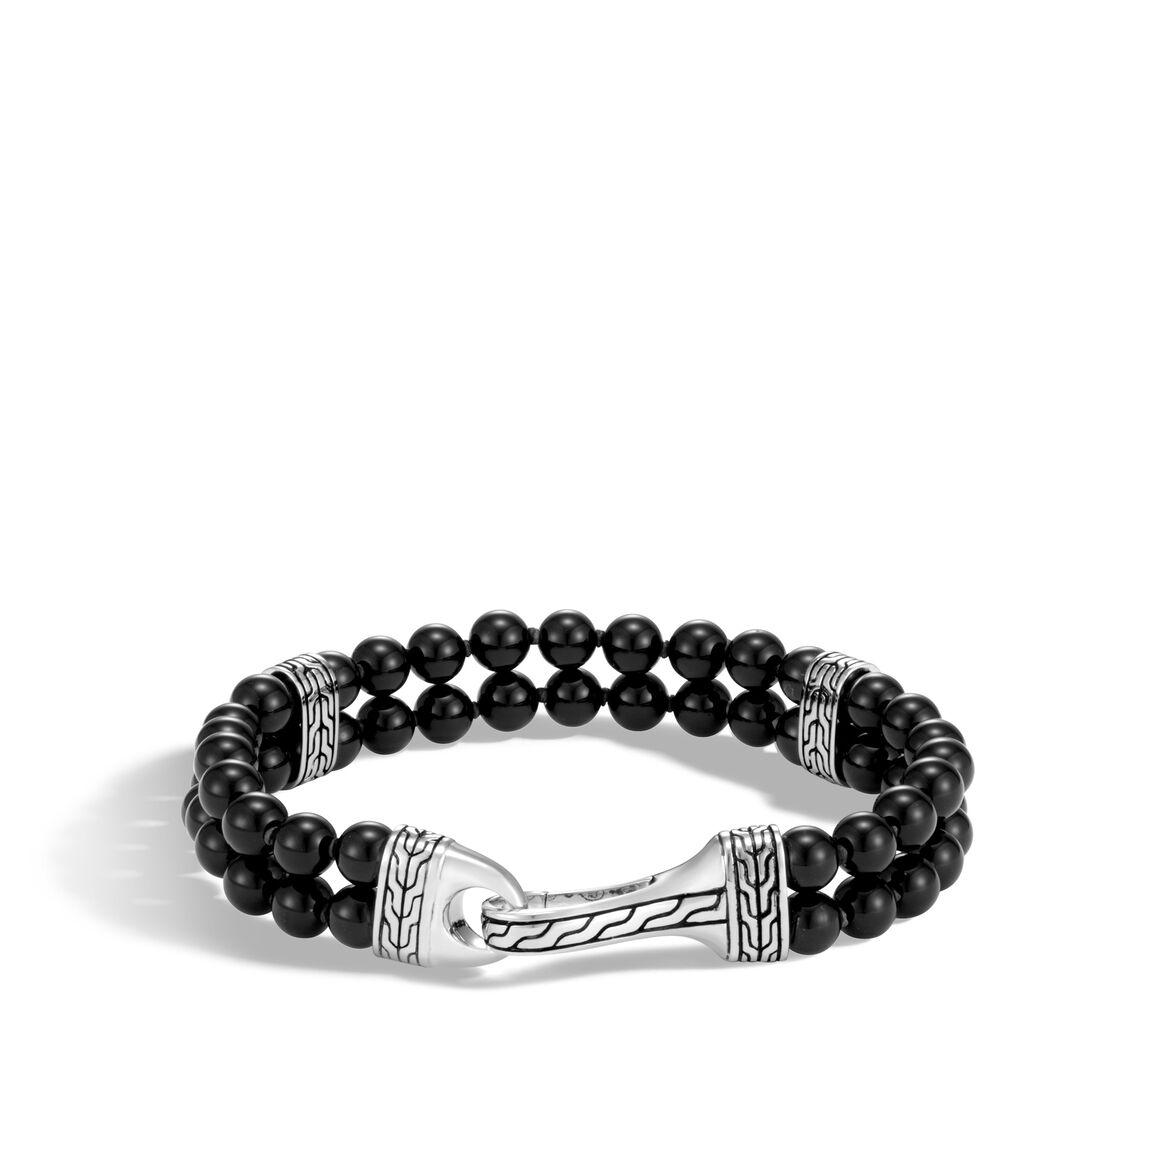 Classic Chain Double Row Bead Bracelet in Silver, Gemstone